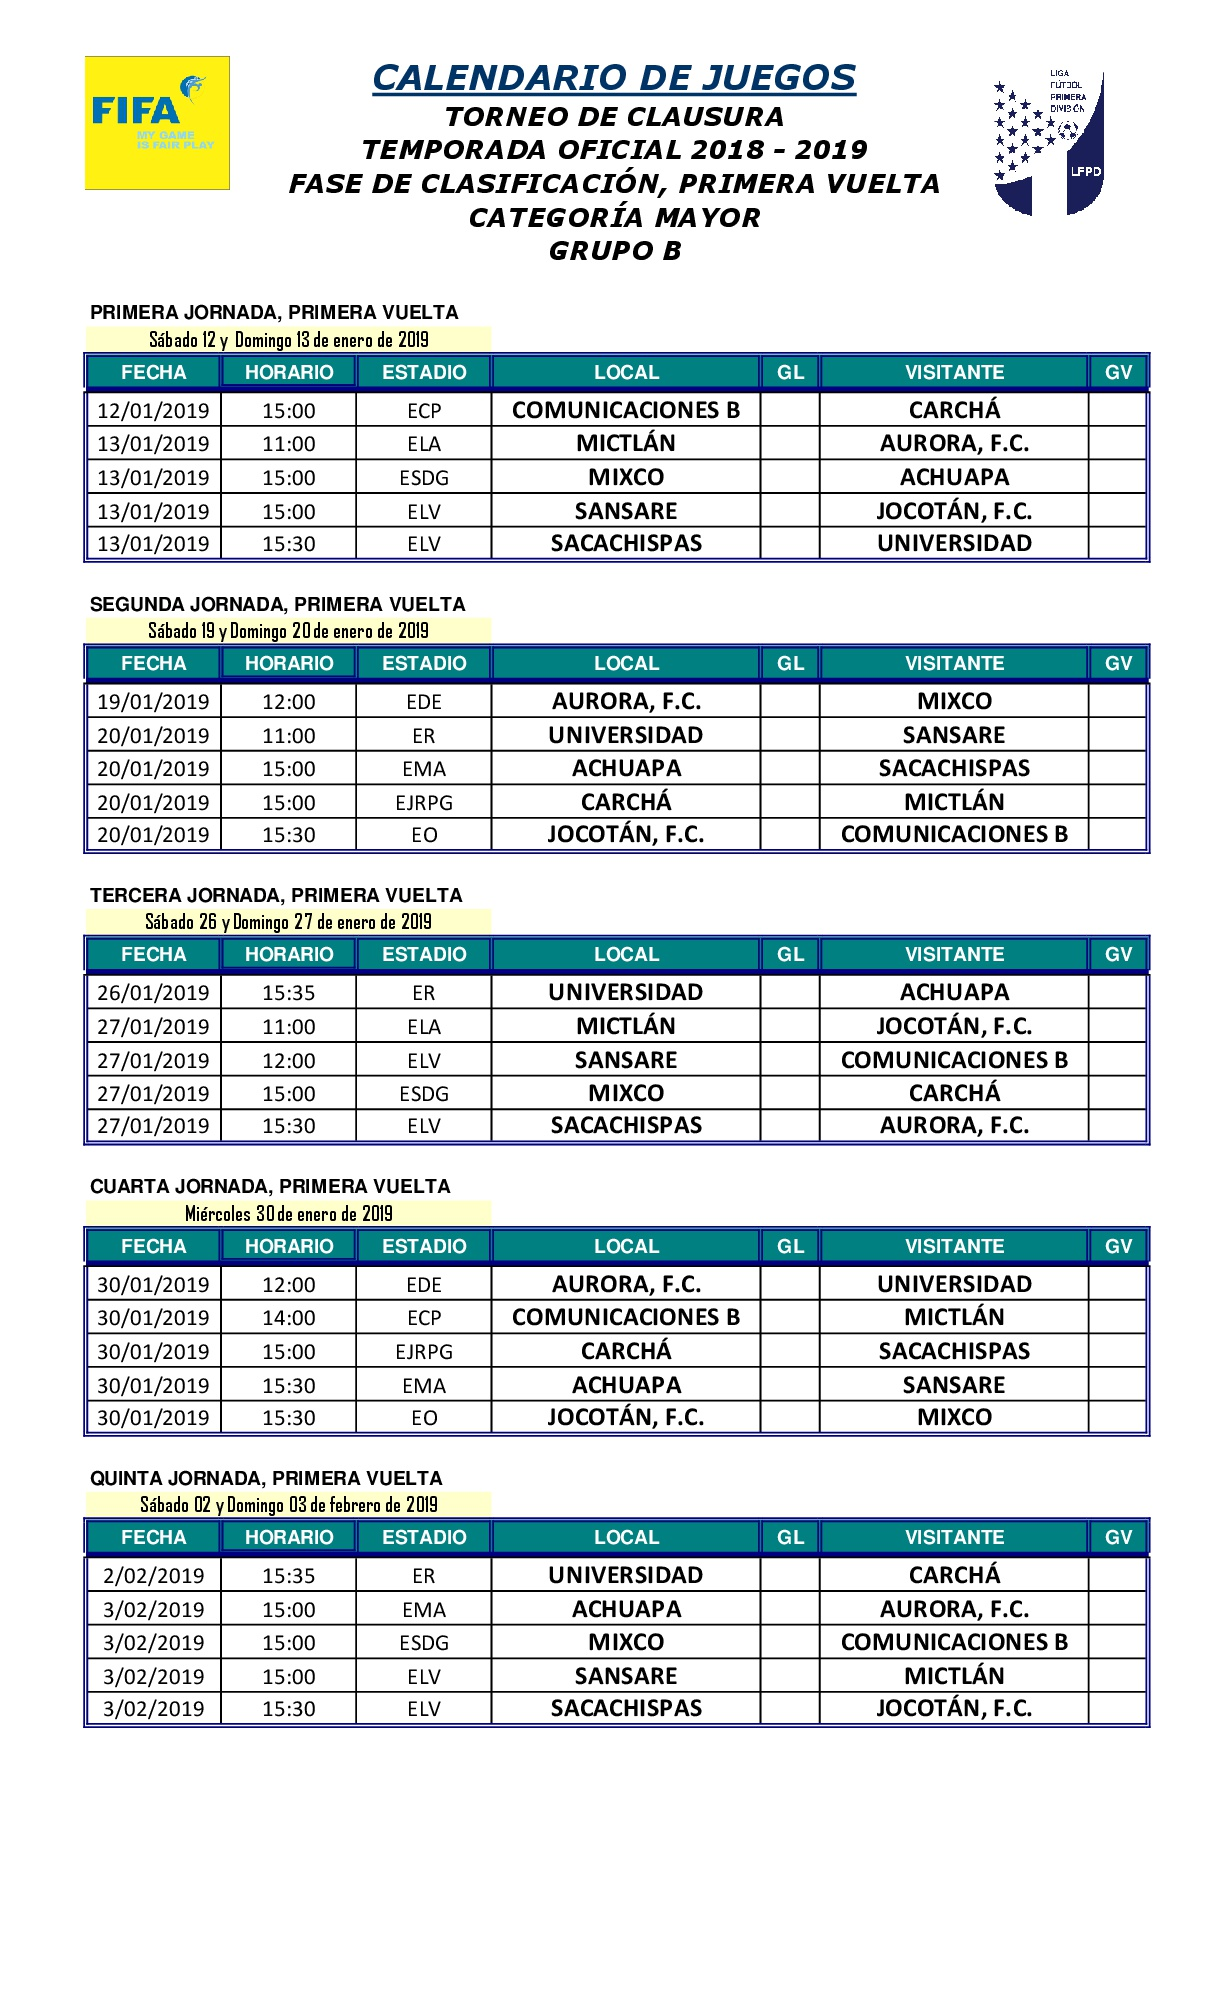 Calendario Primera Division Futbol Guatemala 2019.2 Calendario De Juegos Clausura T O 2018 2019 Grupo B 001